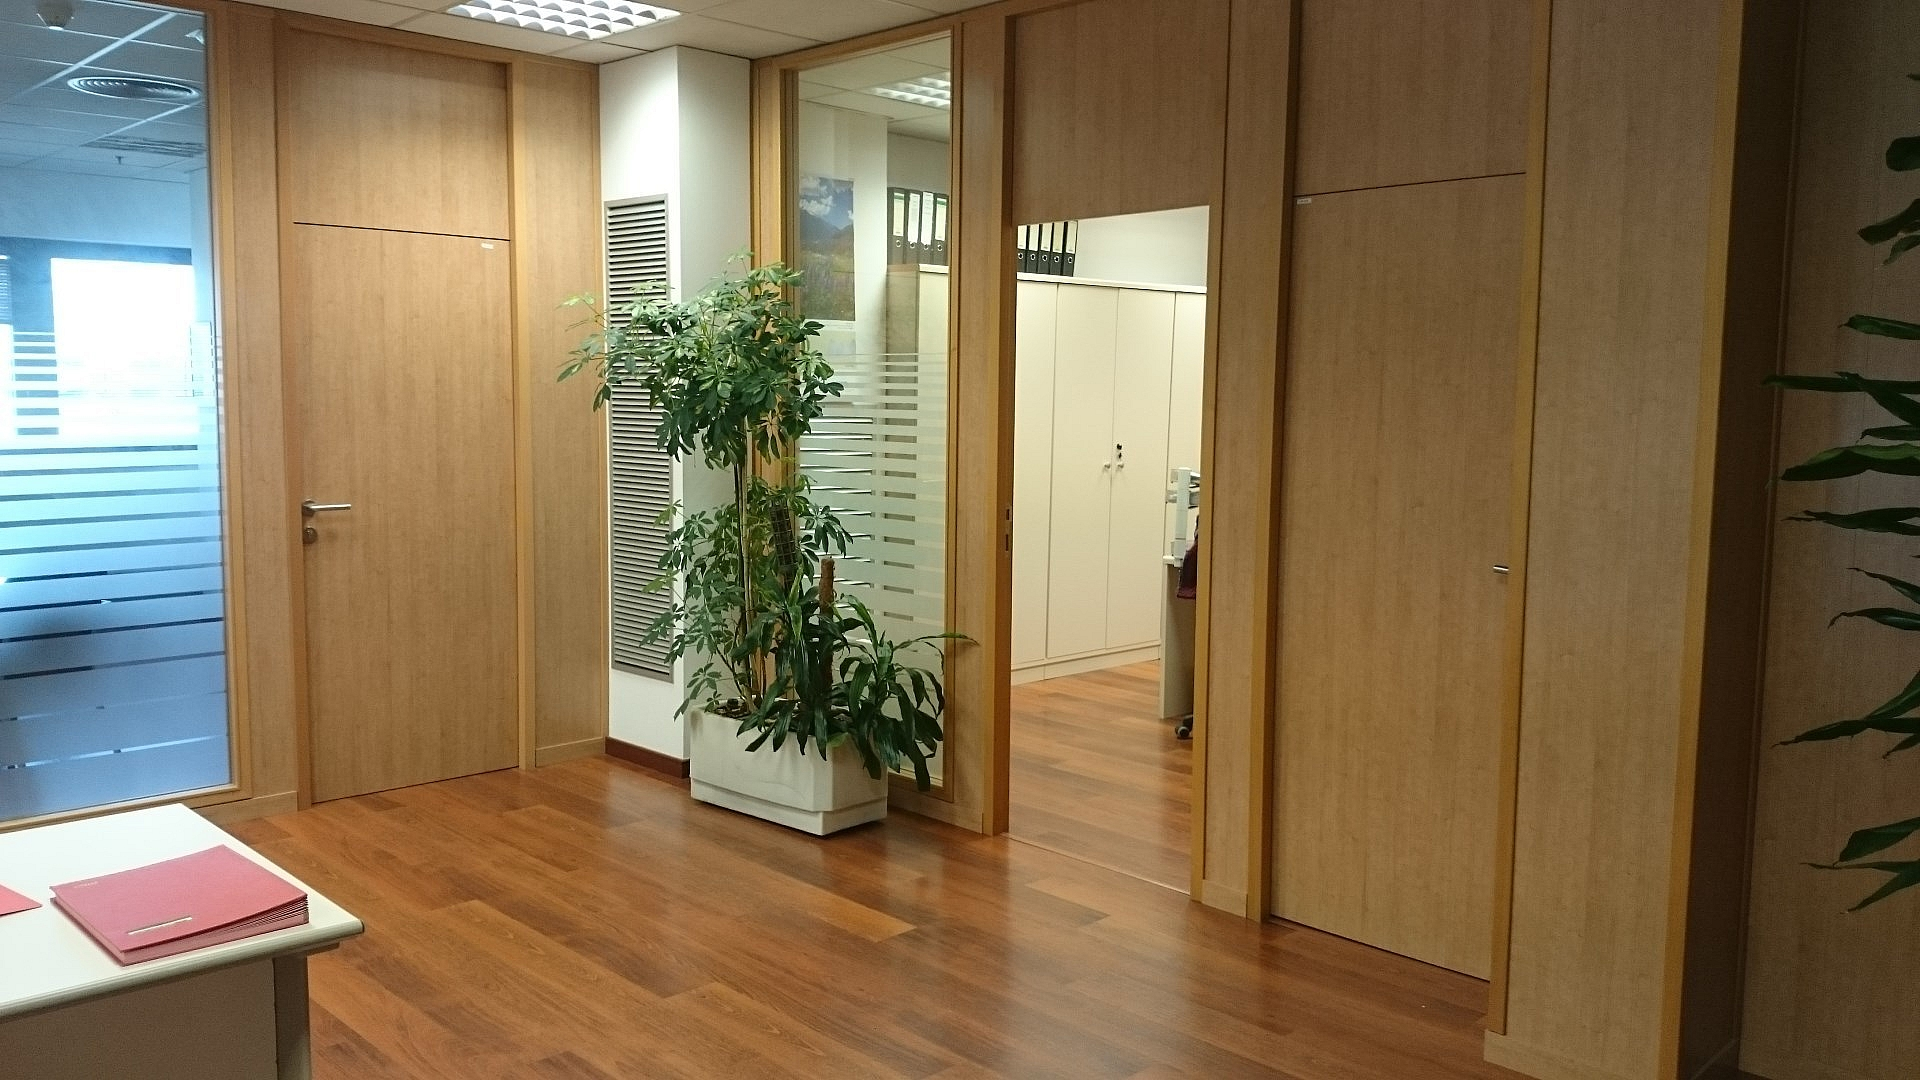 DSC_3193 - Oficina en alquiler en calle Ciclisme, Rubí - 267668052